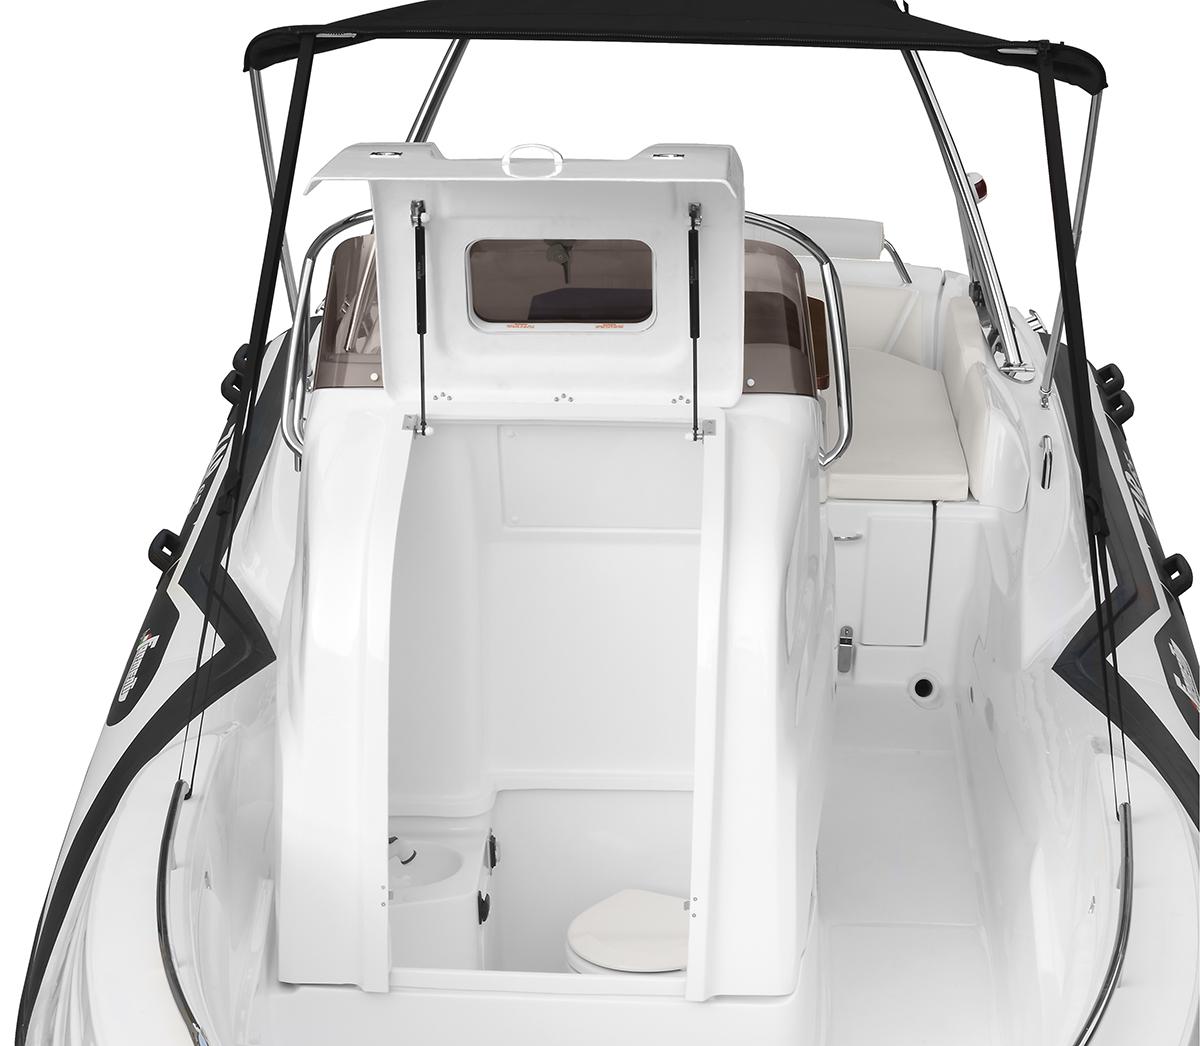 7240 ZAR 65 Plus-Suite bagno aperto fronte RGB.jpg